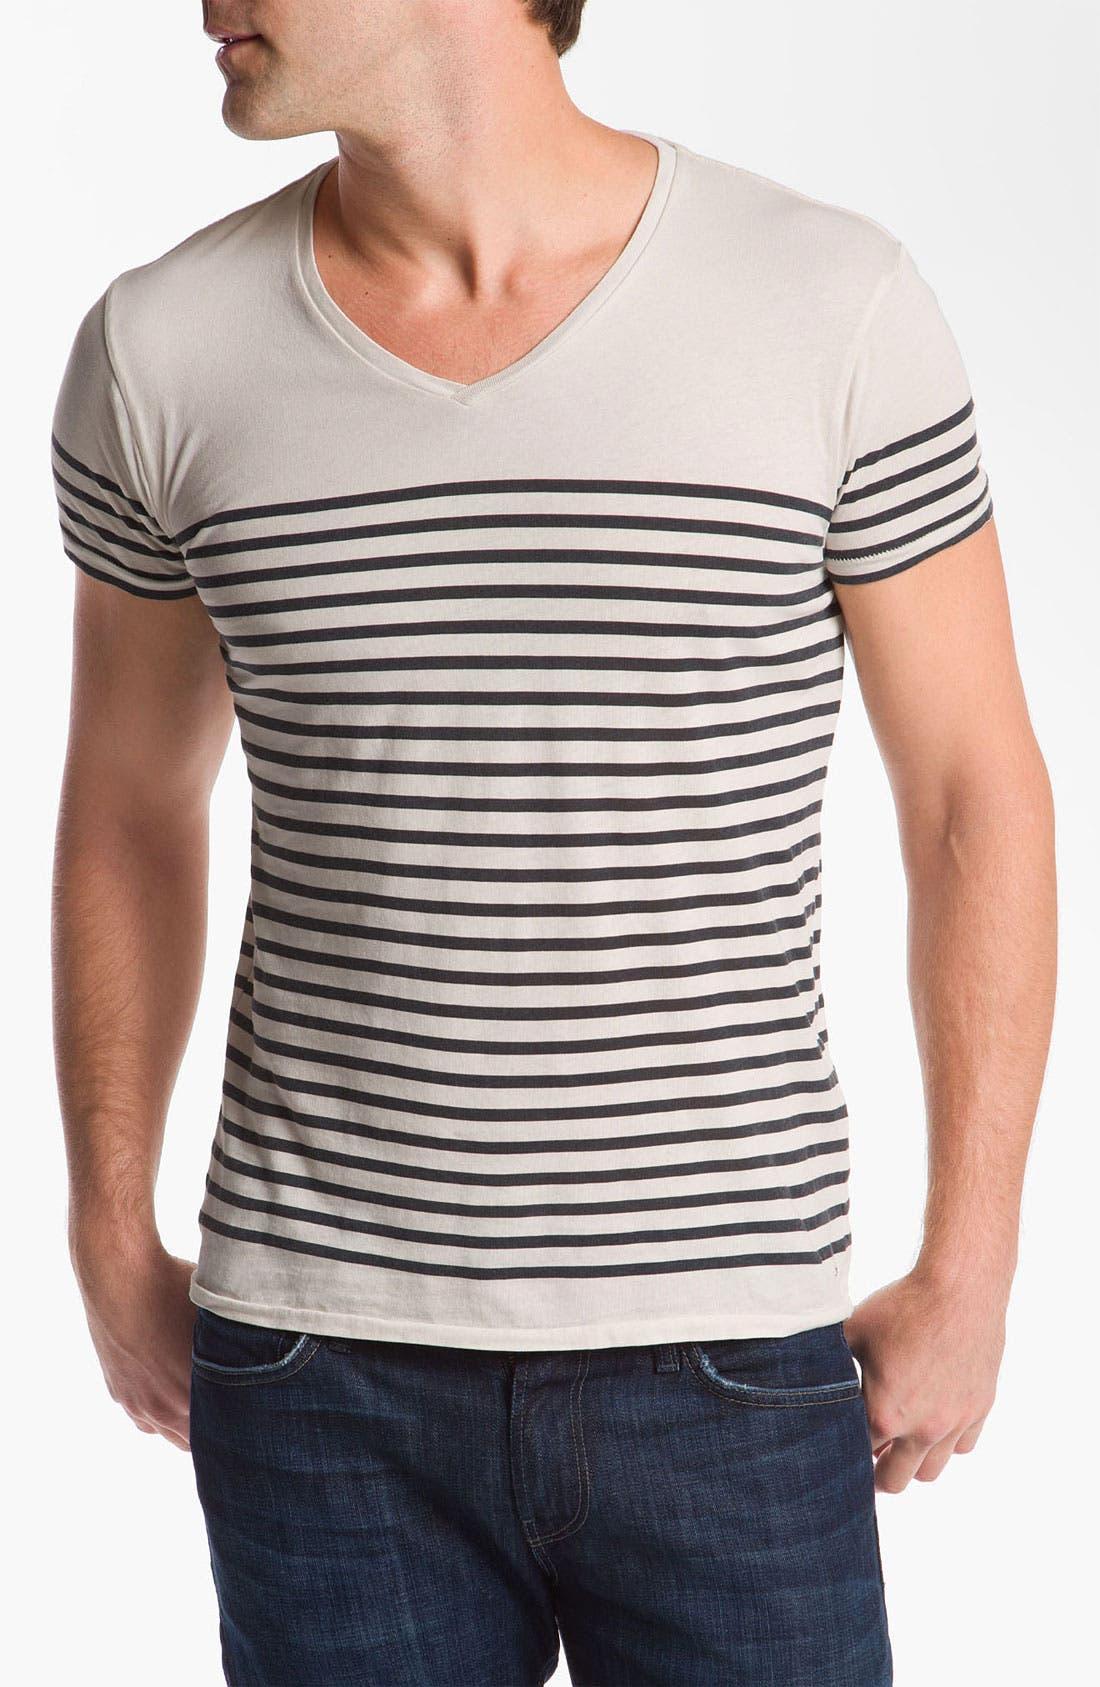 Alternate Image 1 Selected - Scotch & Soda Oil Washed V-Neck T-Shirt